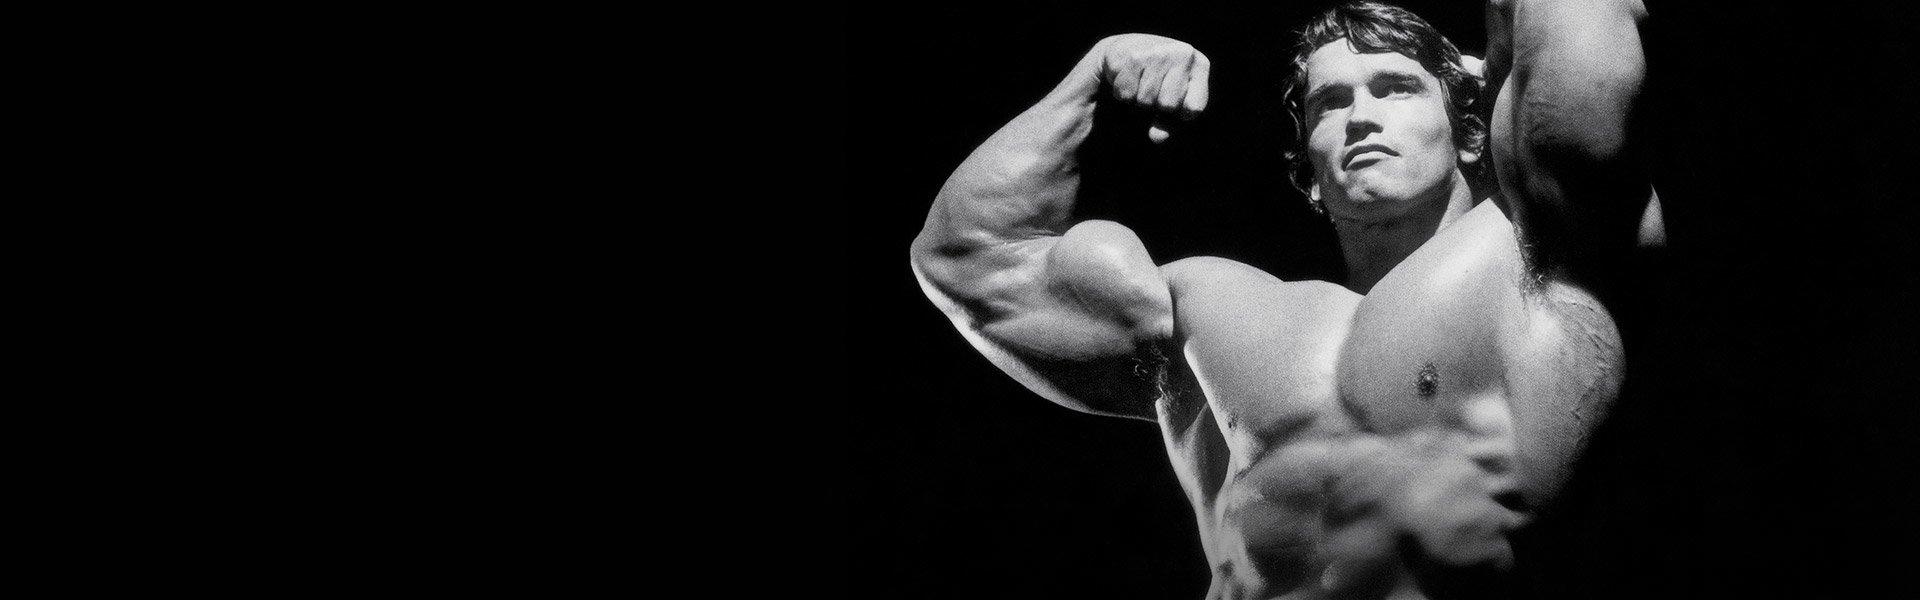 Arnold schwarzenegger workout supplements reviews most popular arnold schwarzenegger blueprint trainer day 2 malvernweather Images